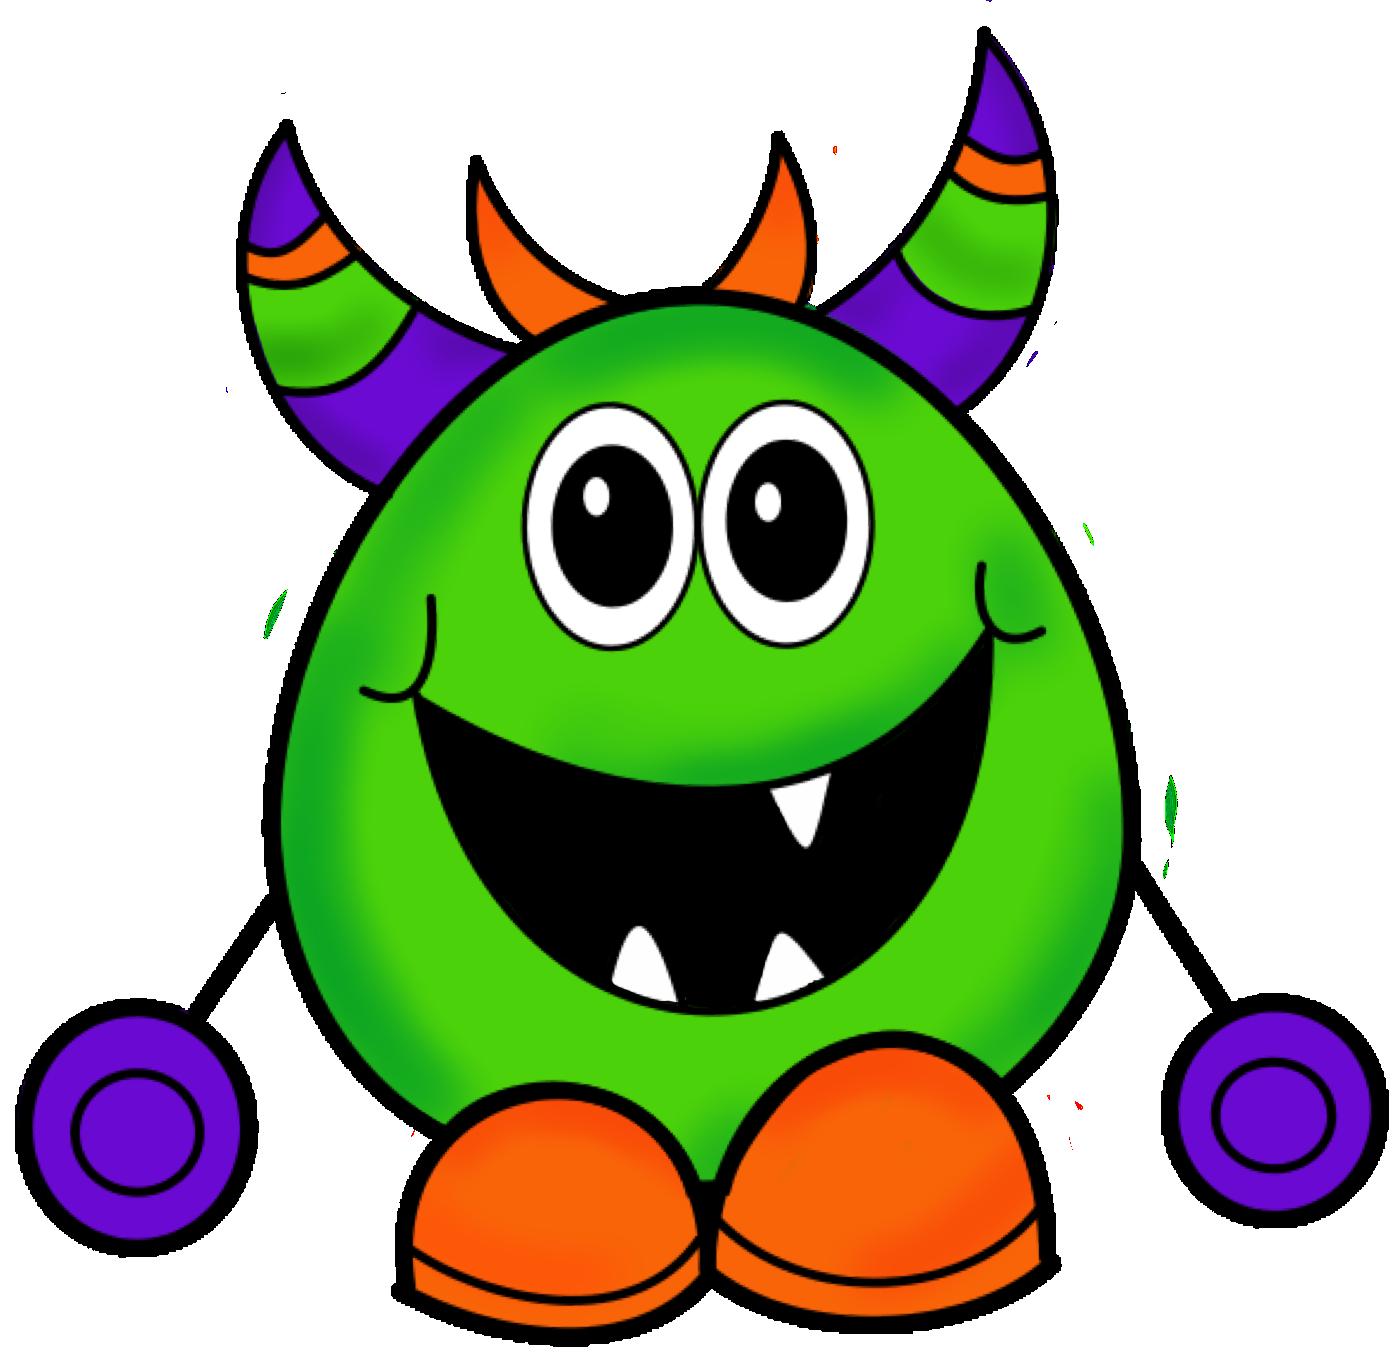 Screaming clipart halloween monster Halloween%20monster%20clipart Panda Clipart Halloween Free